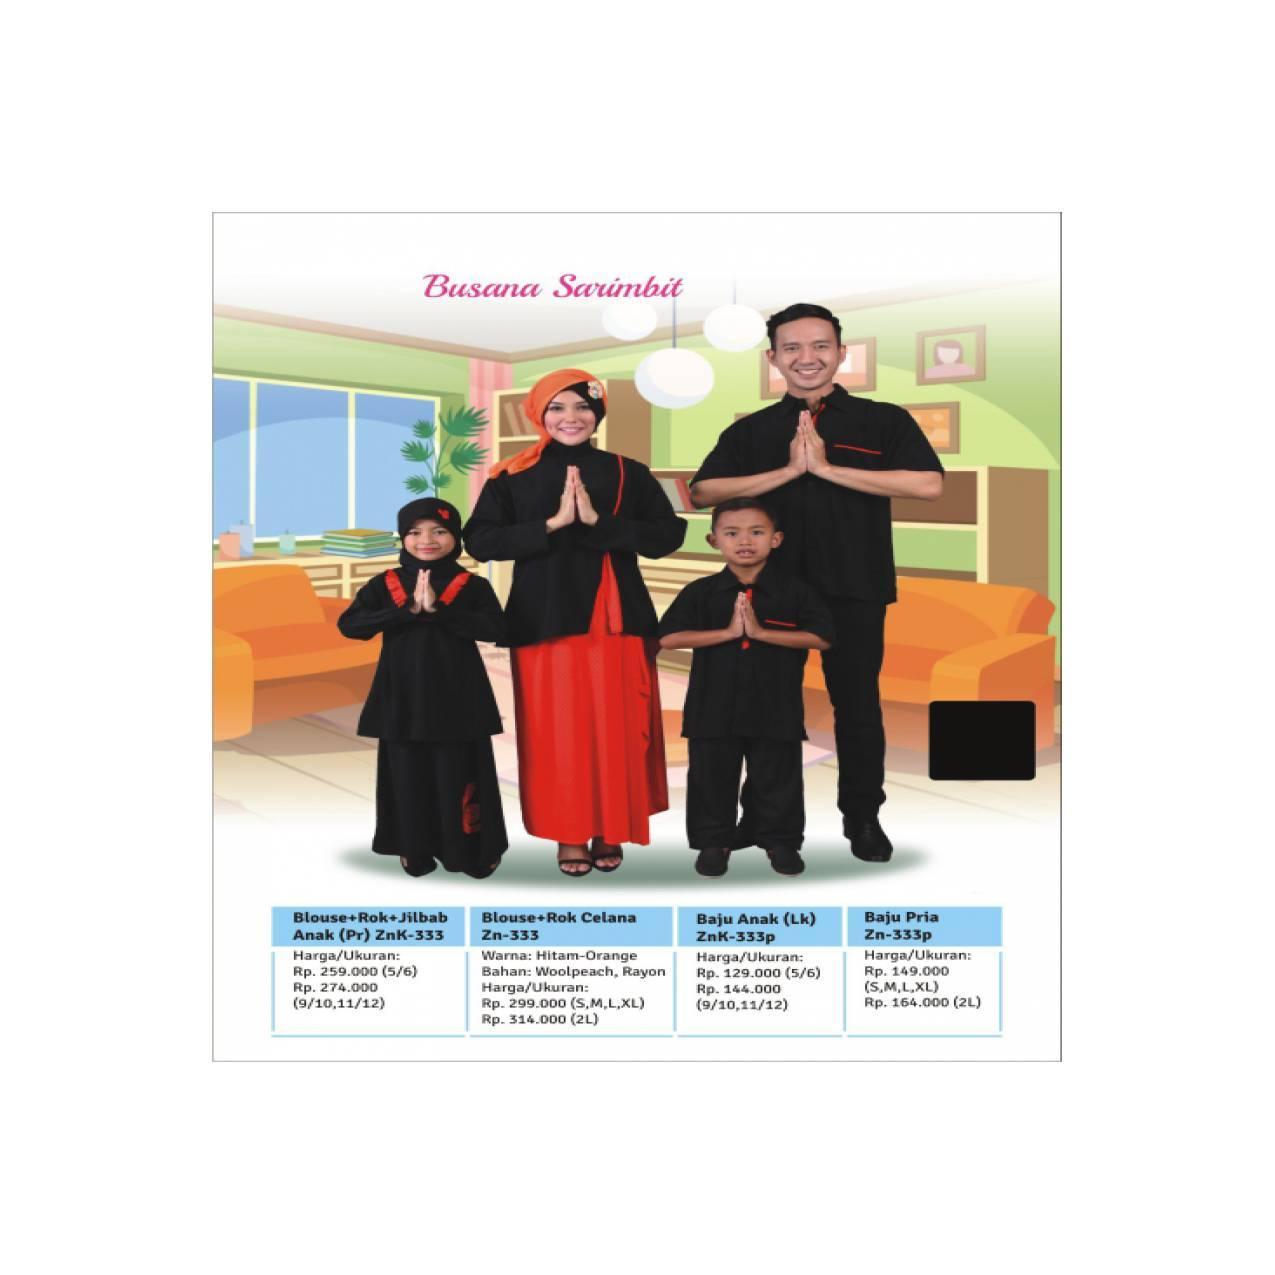 Sarimbit Keluarga Terbaru - Zenitha - ZN 333 Hitam - Baju Keluarga